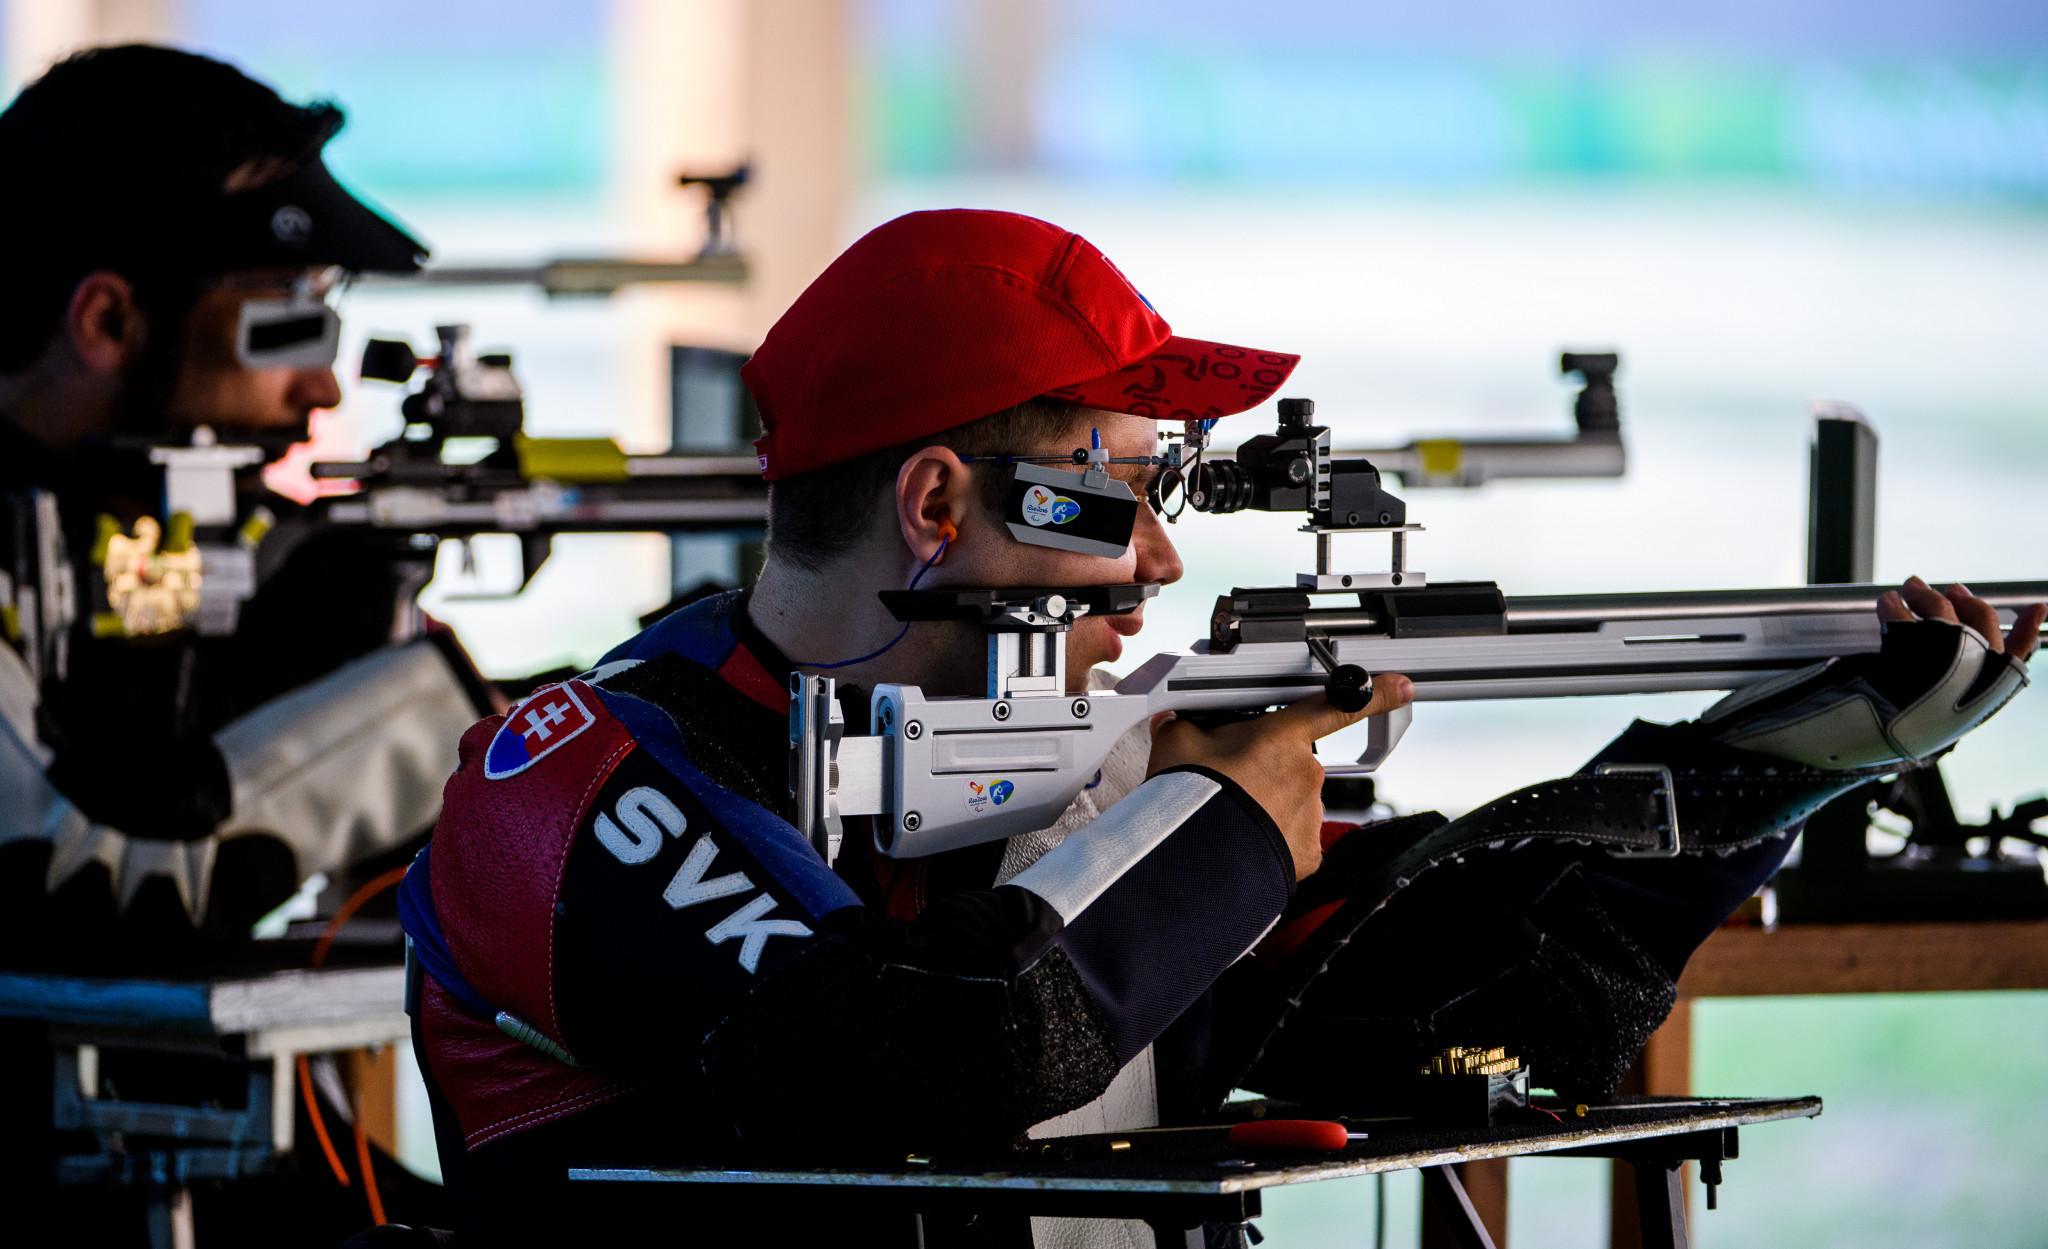 Malenovsky makes most of reprieve as Slovakian earns World Shooting Para Sport Championship gold